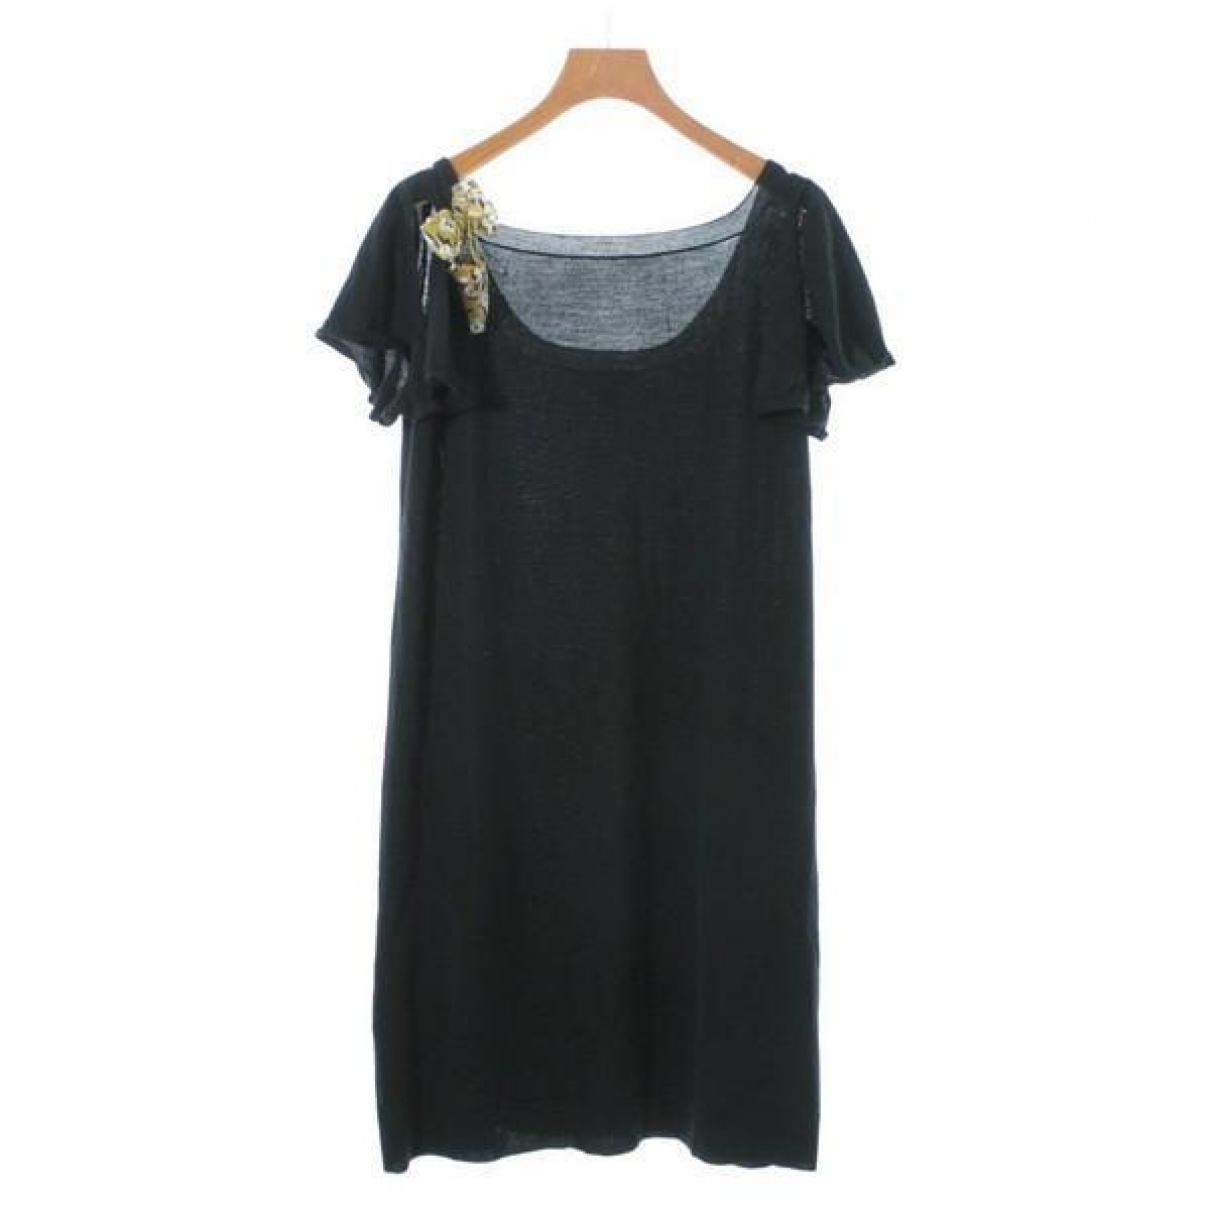 Louis Vuitton \N Black Wool dress for Women M International